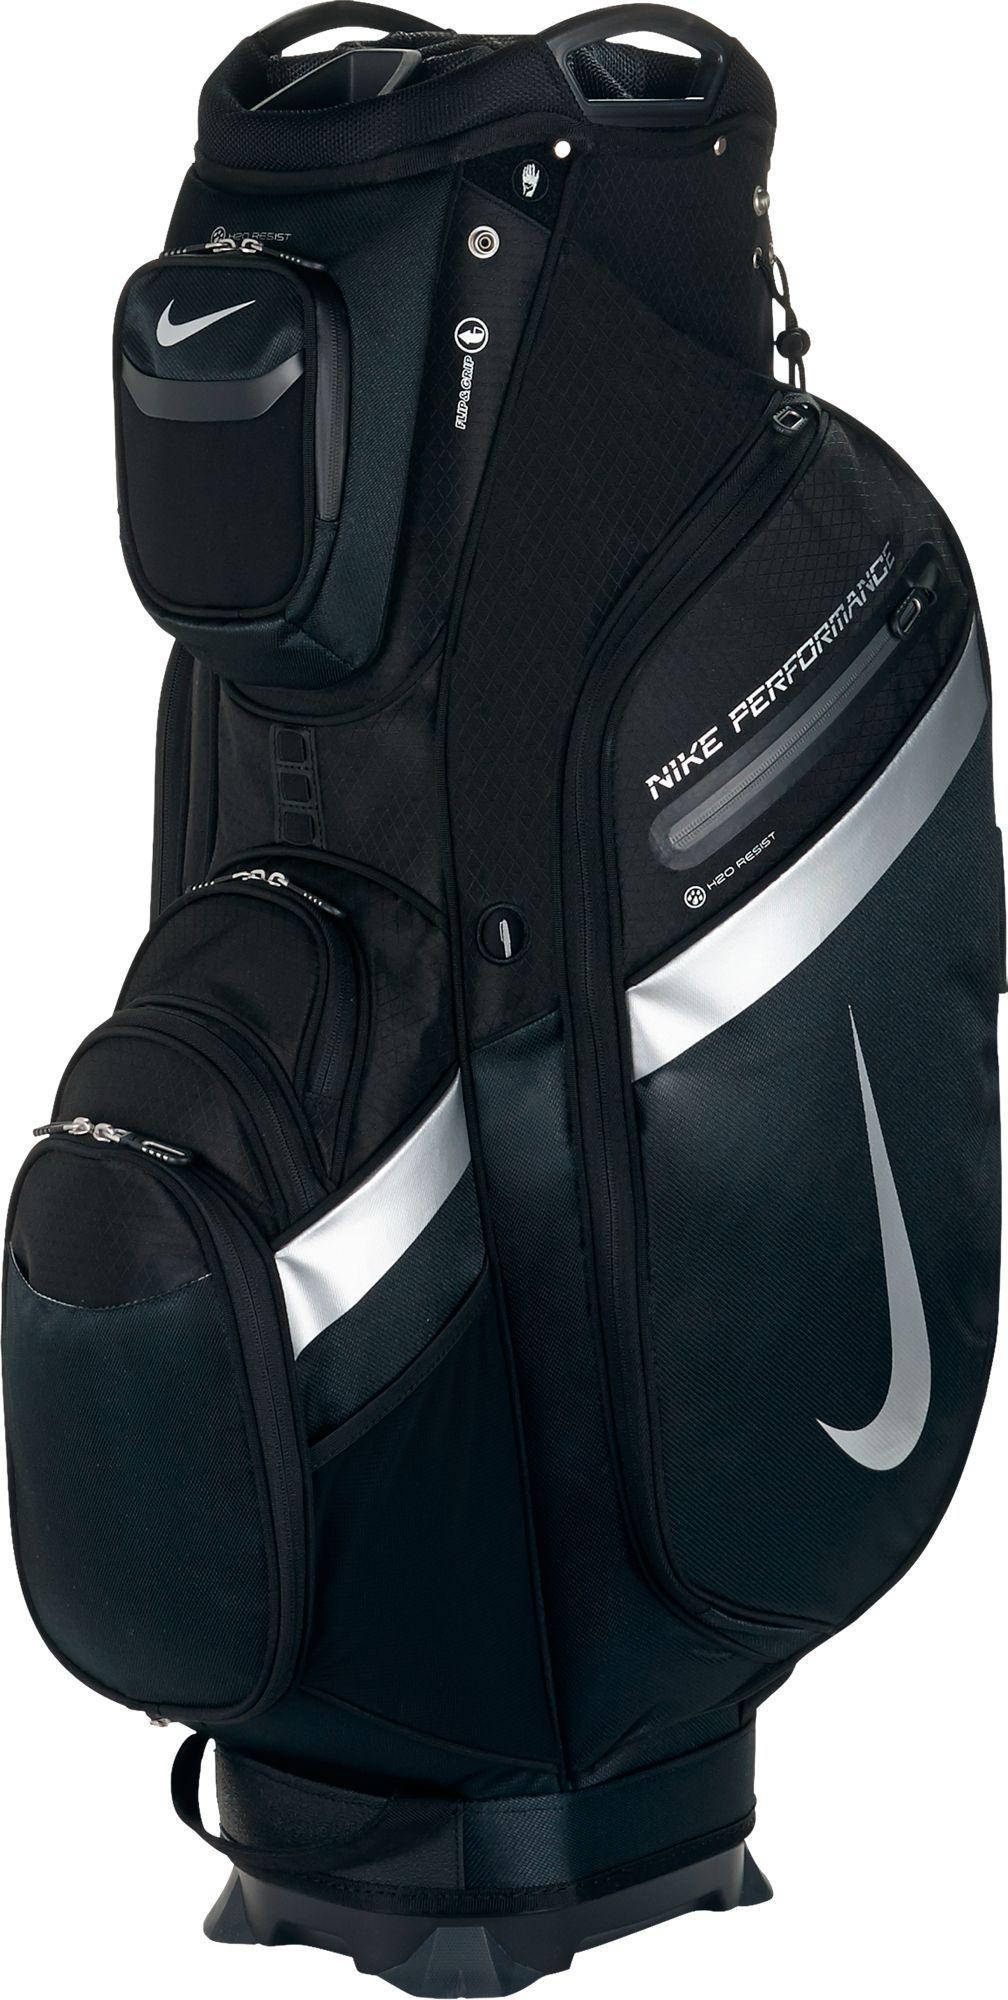 0263a5e08a Nike Performance IV Cart Bag